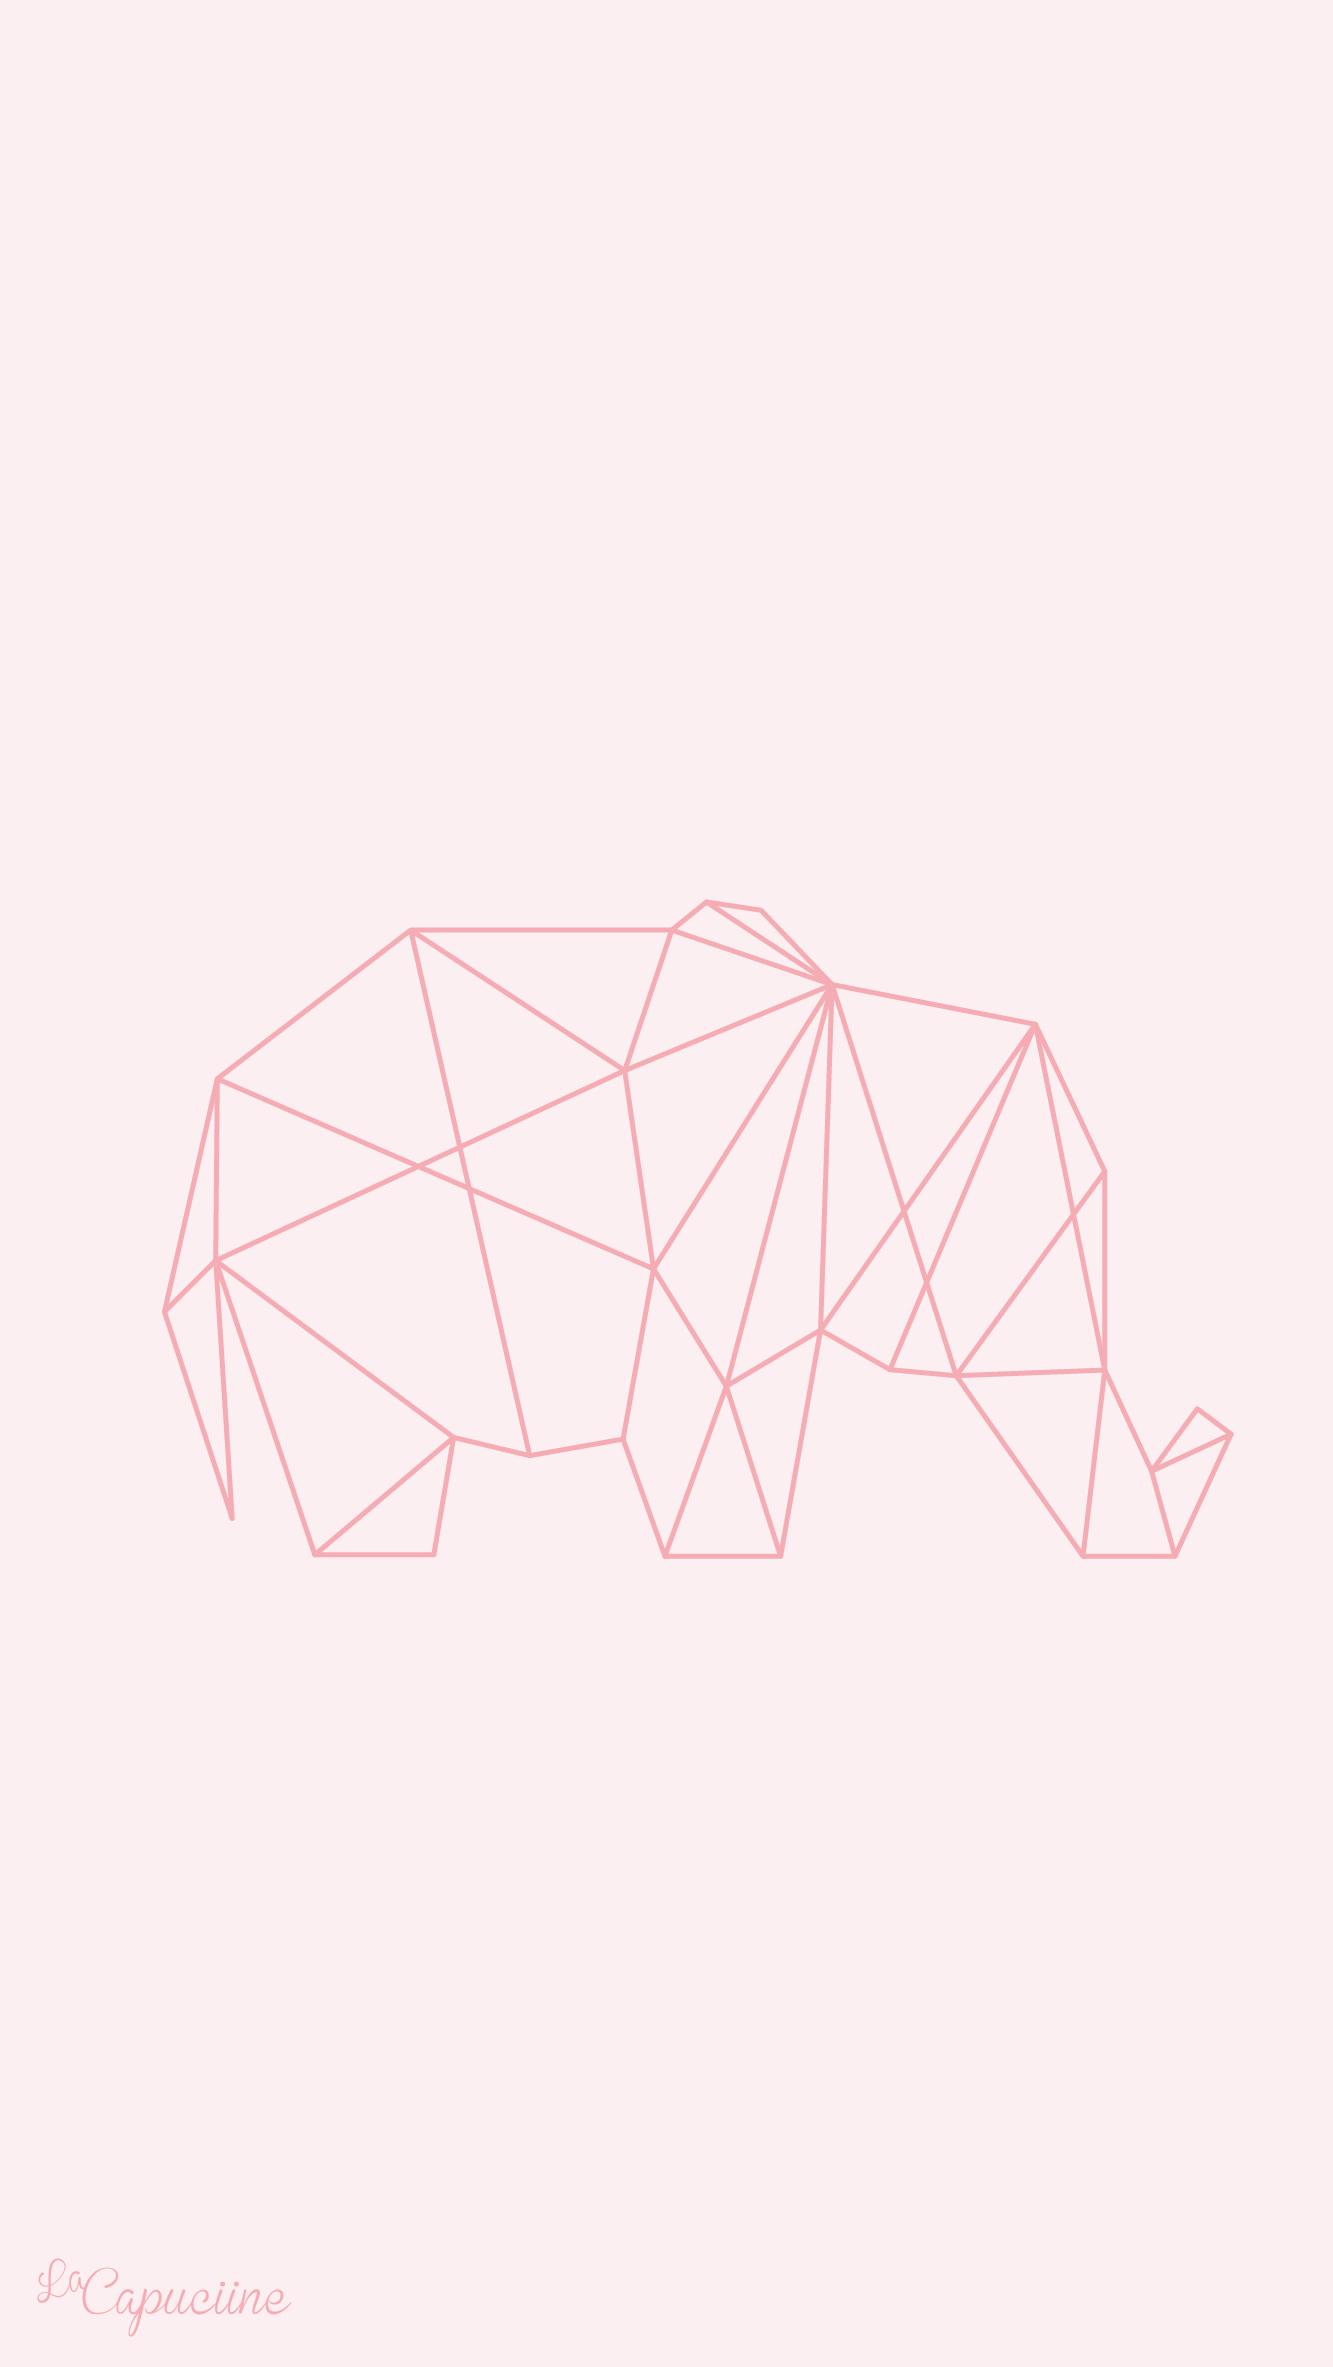 Fond-d%C3%A9cran-%C3%A9l%C3%A9phant-origami-La-Capuciine-wallpaper-wp4806466